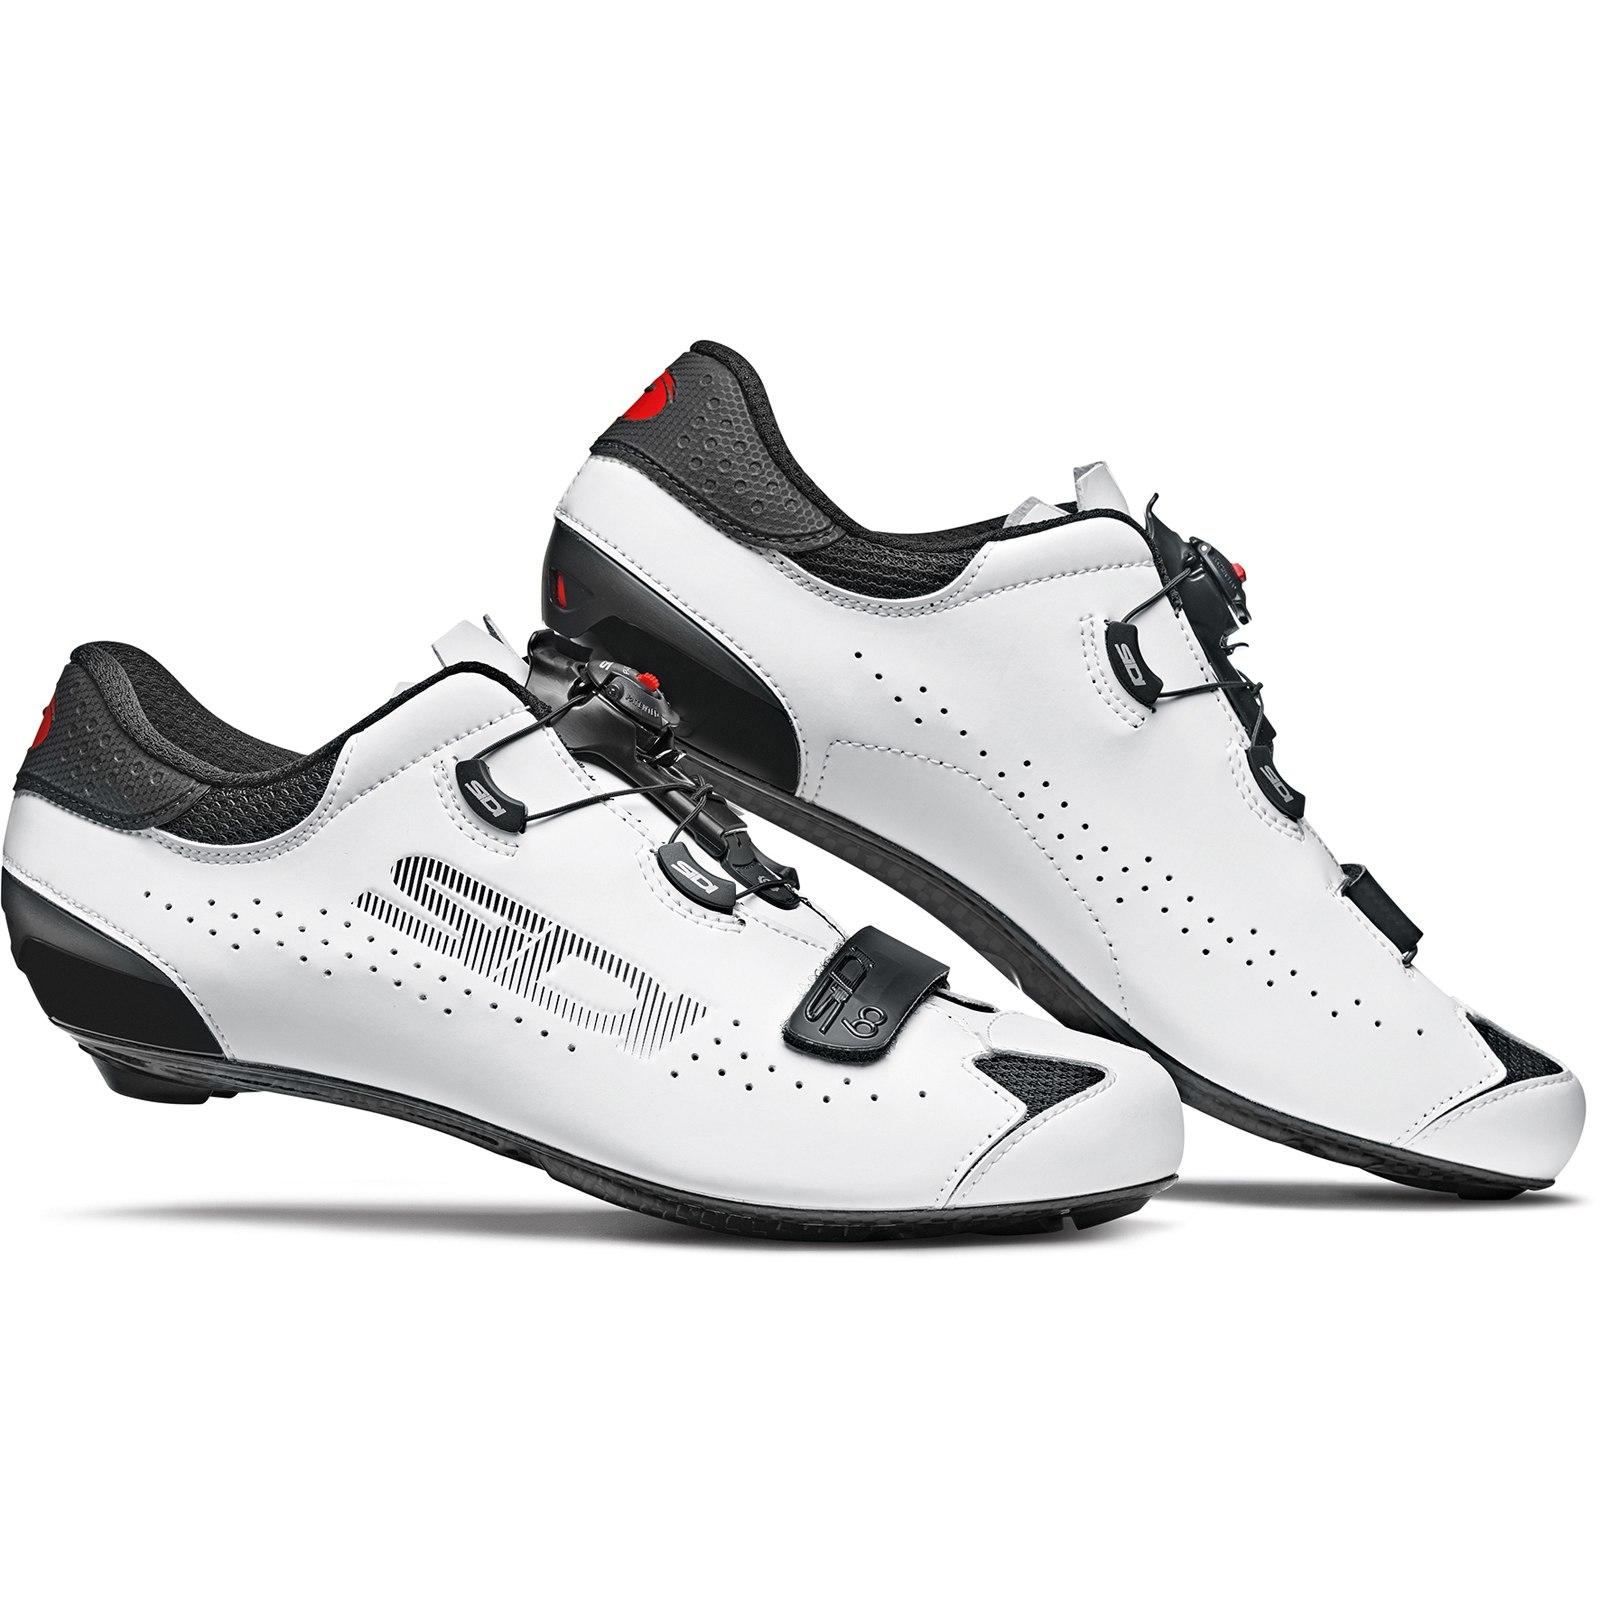 Sidi Sixty - Zapatillas ciclismo carretera - negro/blanco